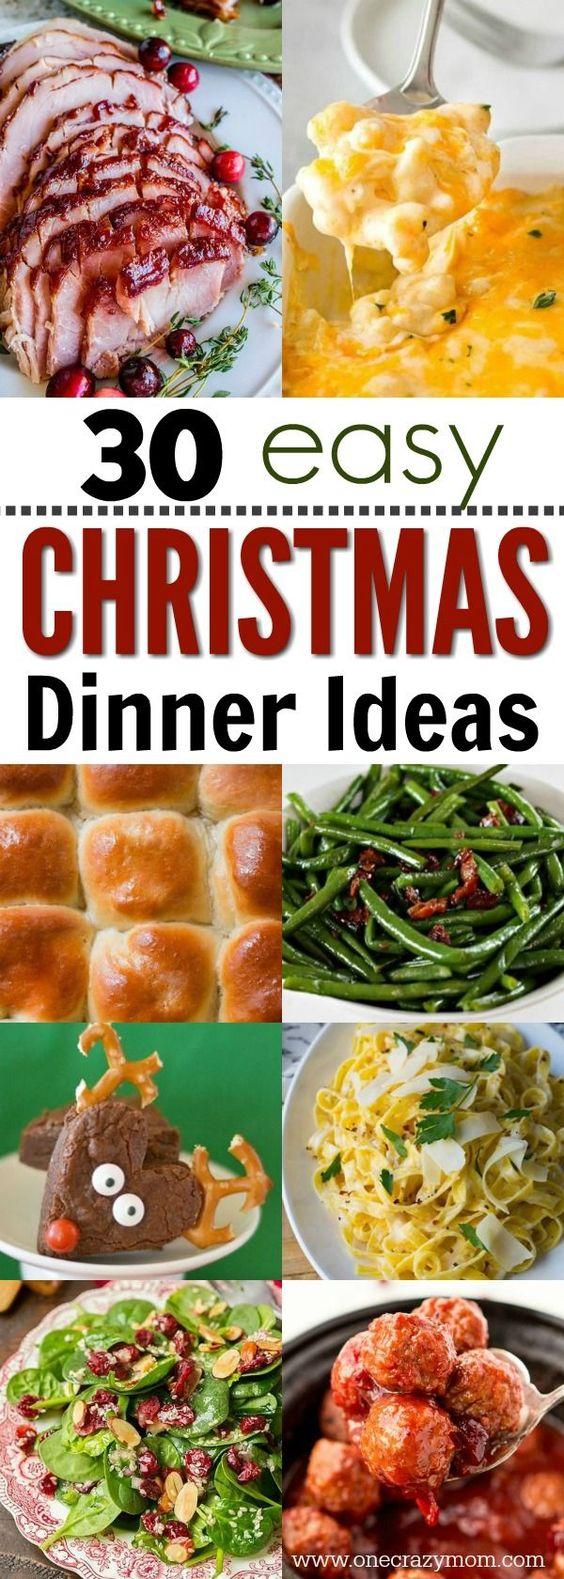 Christmas Dinner Ideas - 30 Christmas Menu Ideas